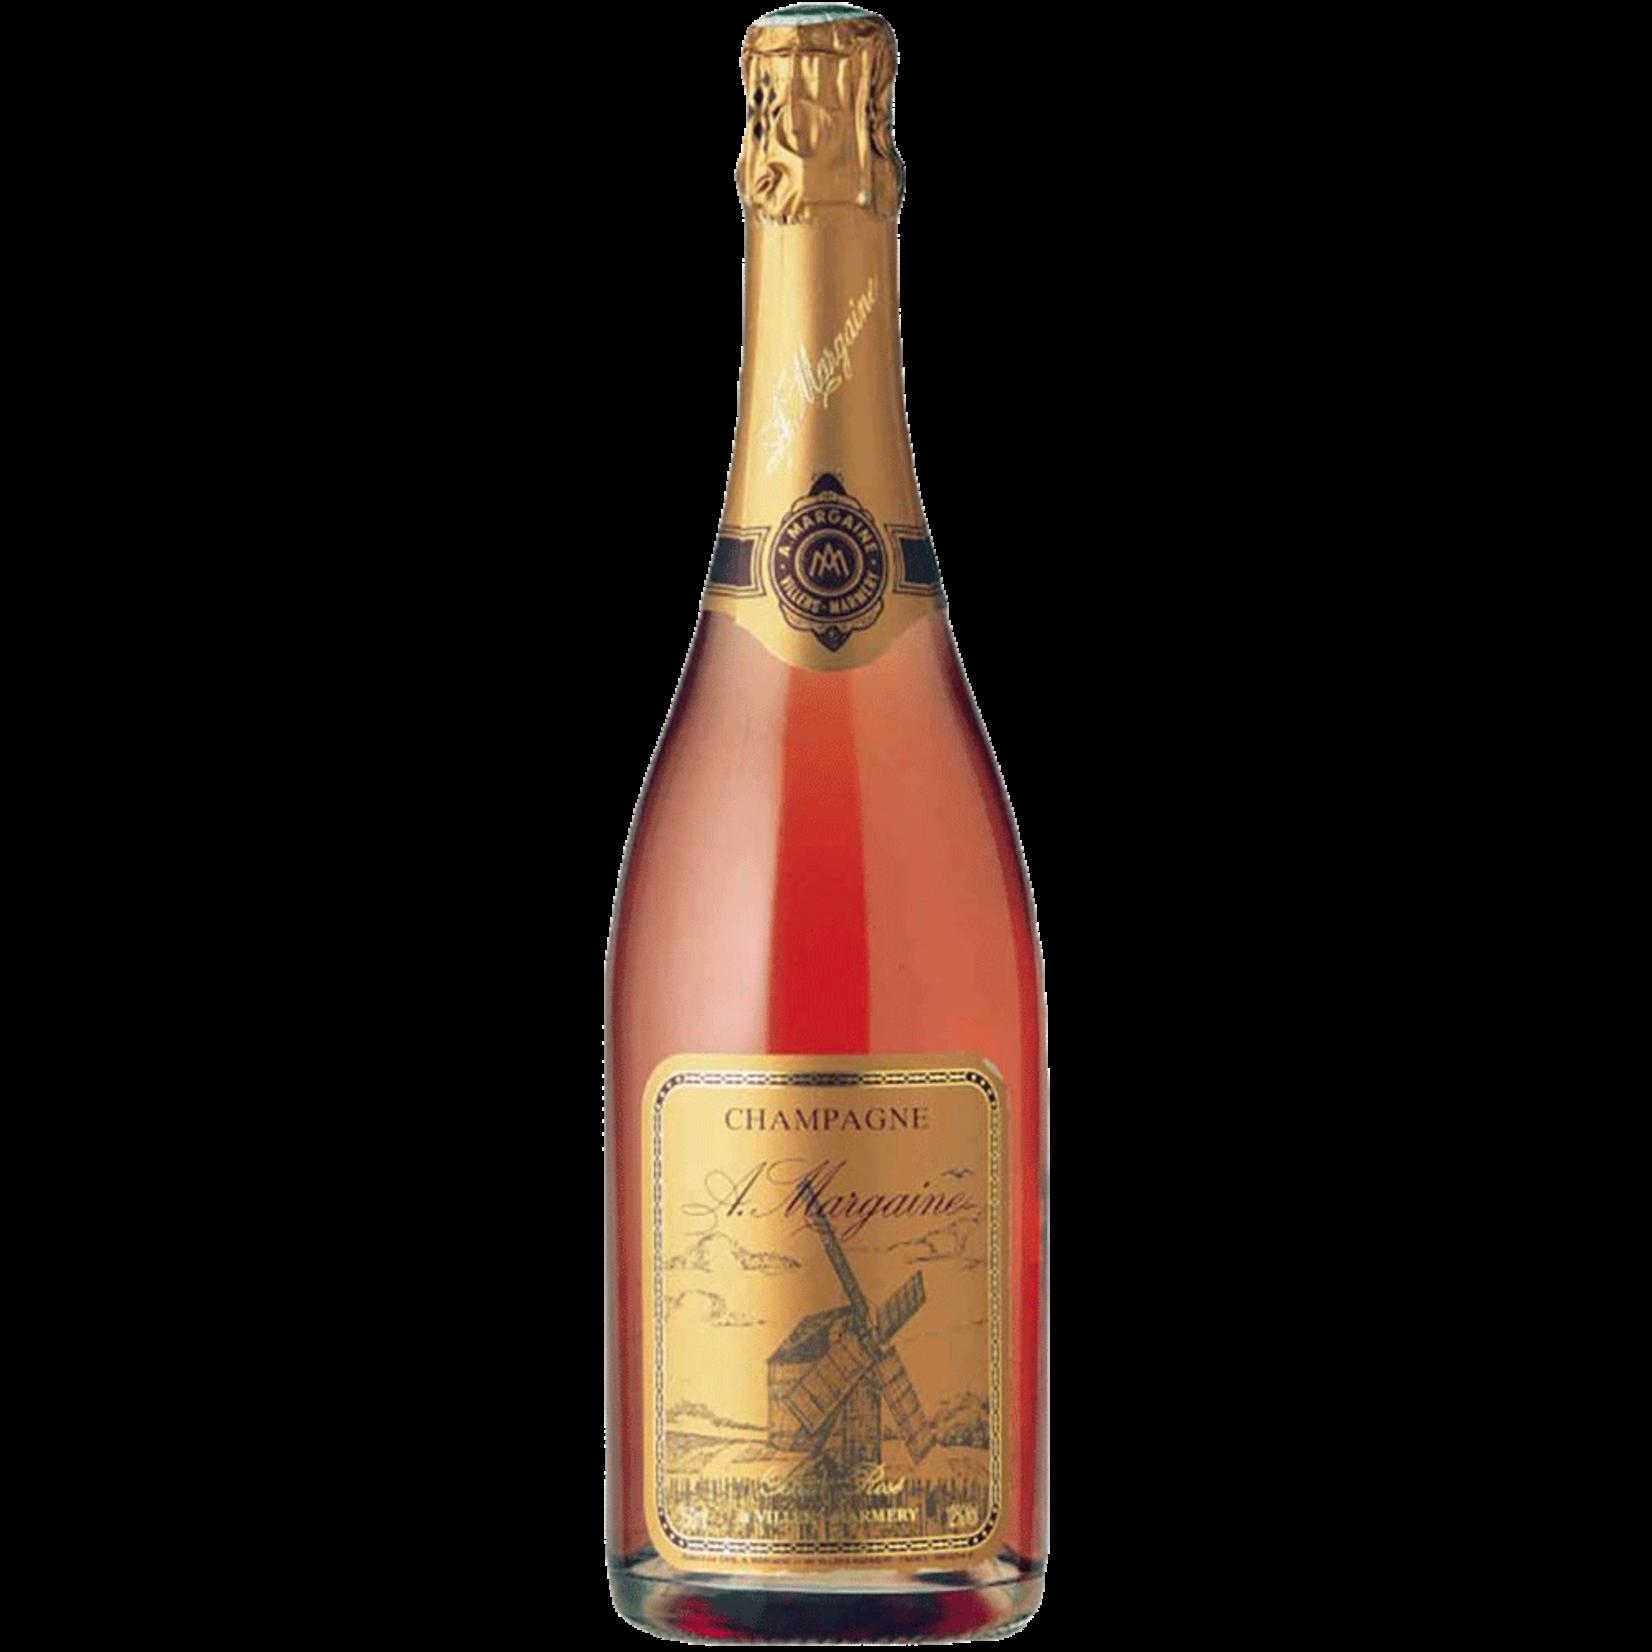 Sparkling A Margaine Champagne Brut Rose